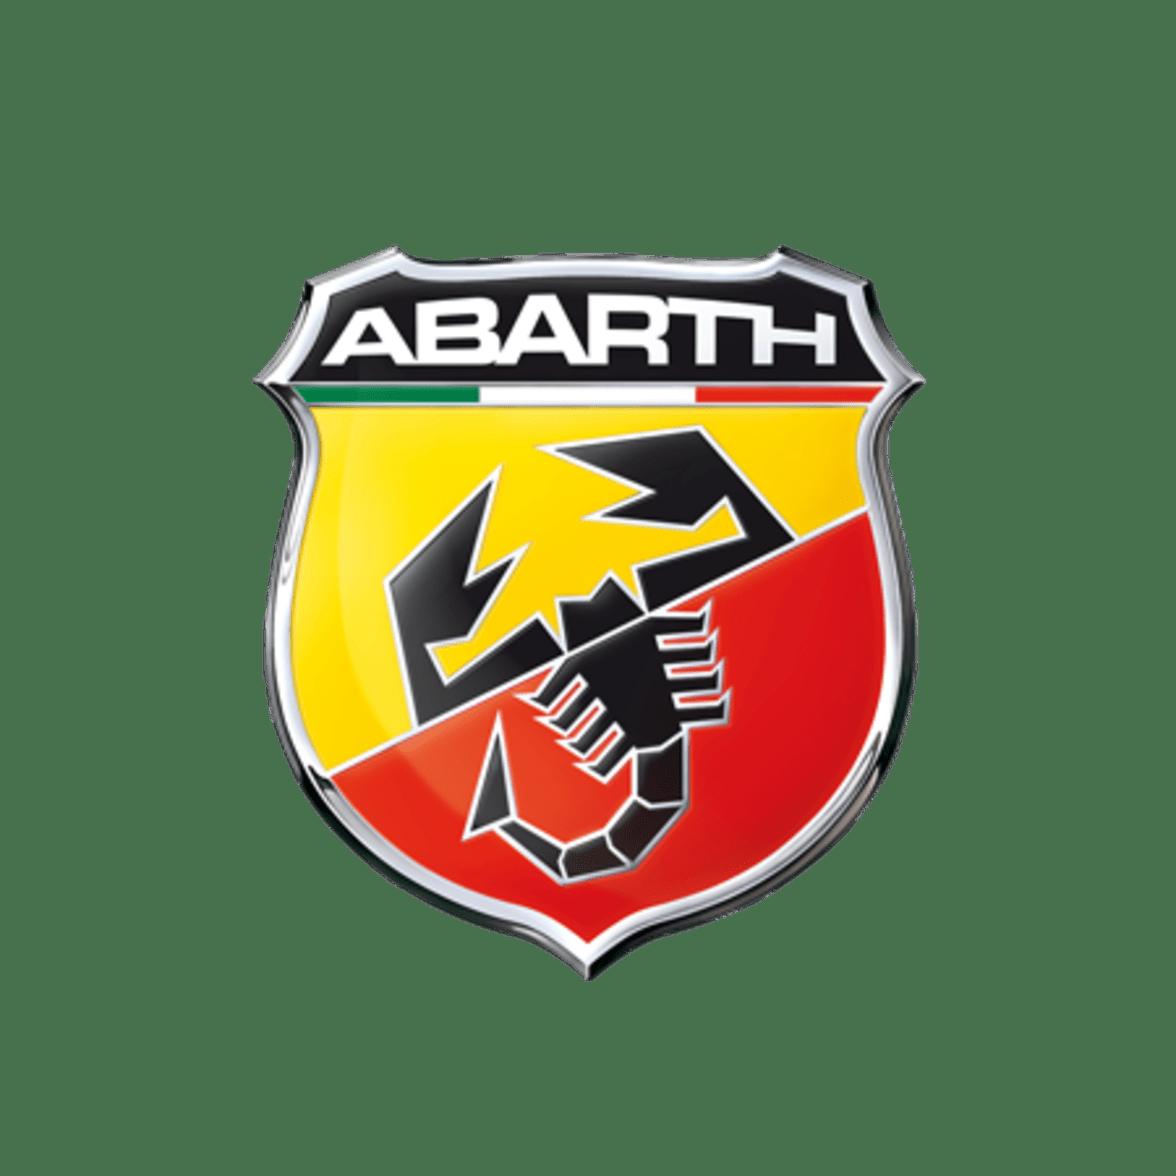 Abarth Dealer | Corby, Northamptonshire | Rockingham Abarth